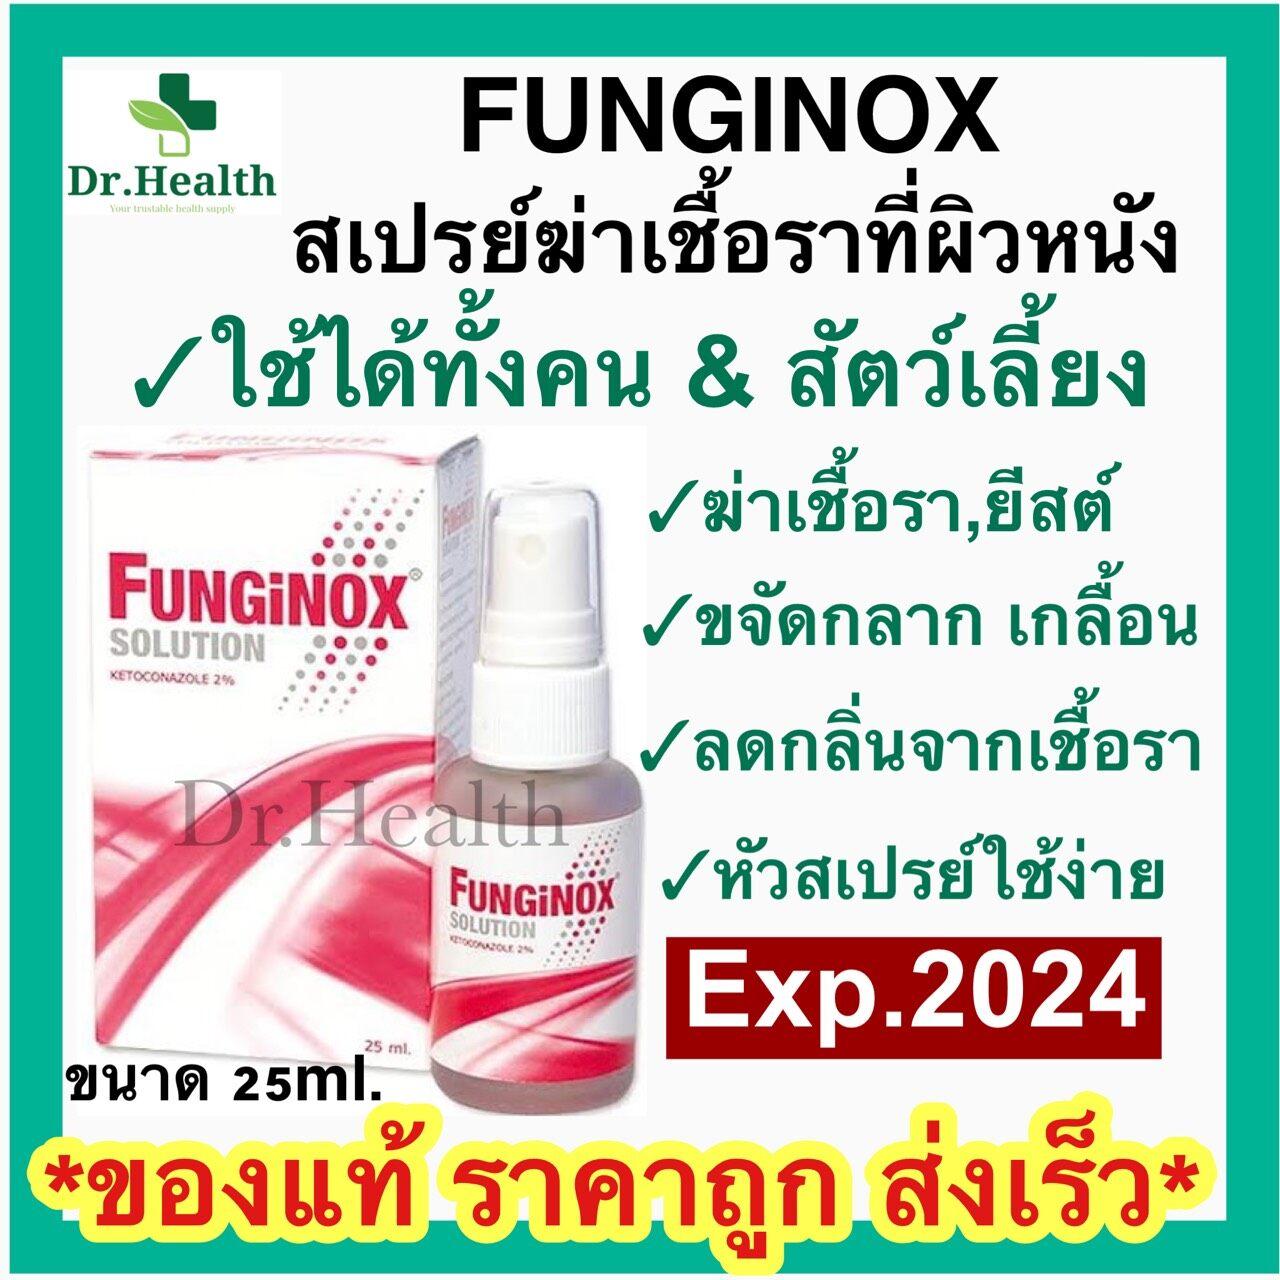 Funginox ฟังจิน็อกซ์ ฆ่าเชื้อรา กลาก เกลื้อน รังแค [exp2024] สุนัข แมว กระต่าย สัตว์เลี้ยง คน ขนาด 25ml.